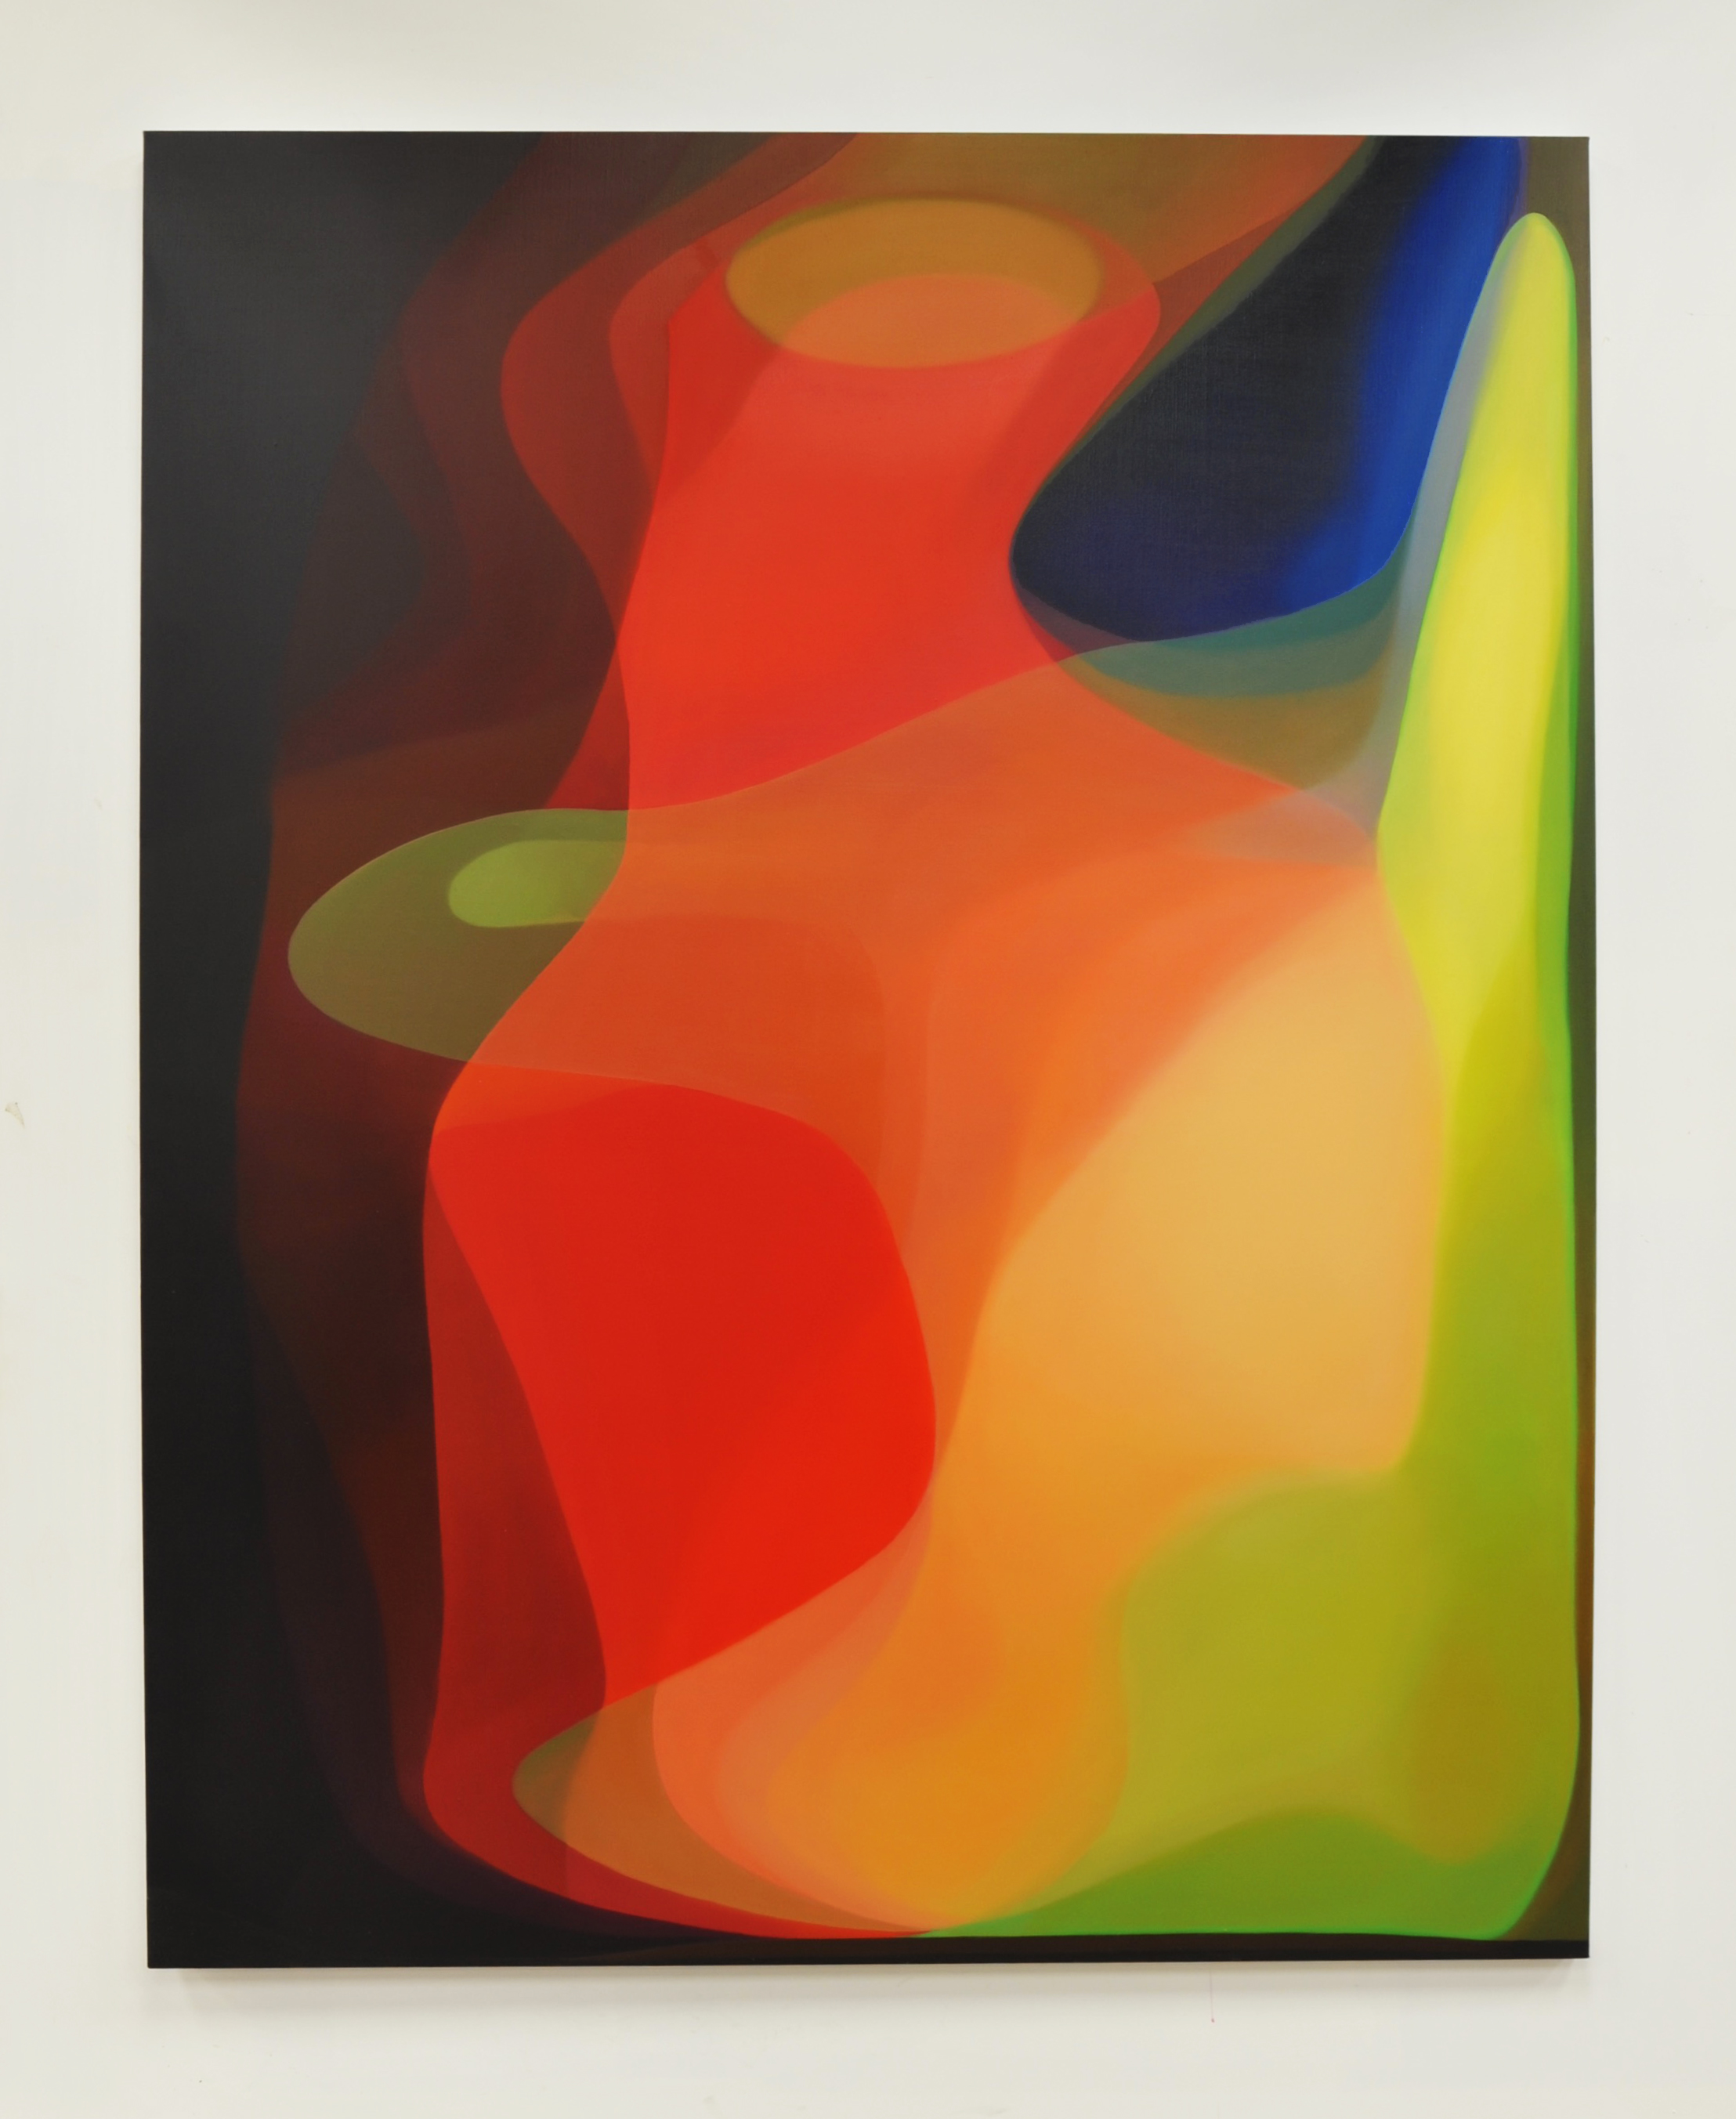 JOHN YOUNG   Spectrum III  2016 Oil on canvas 190 x 150 cm